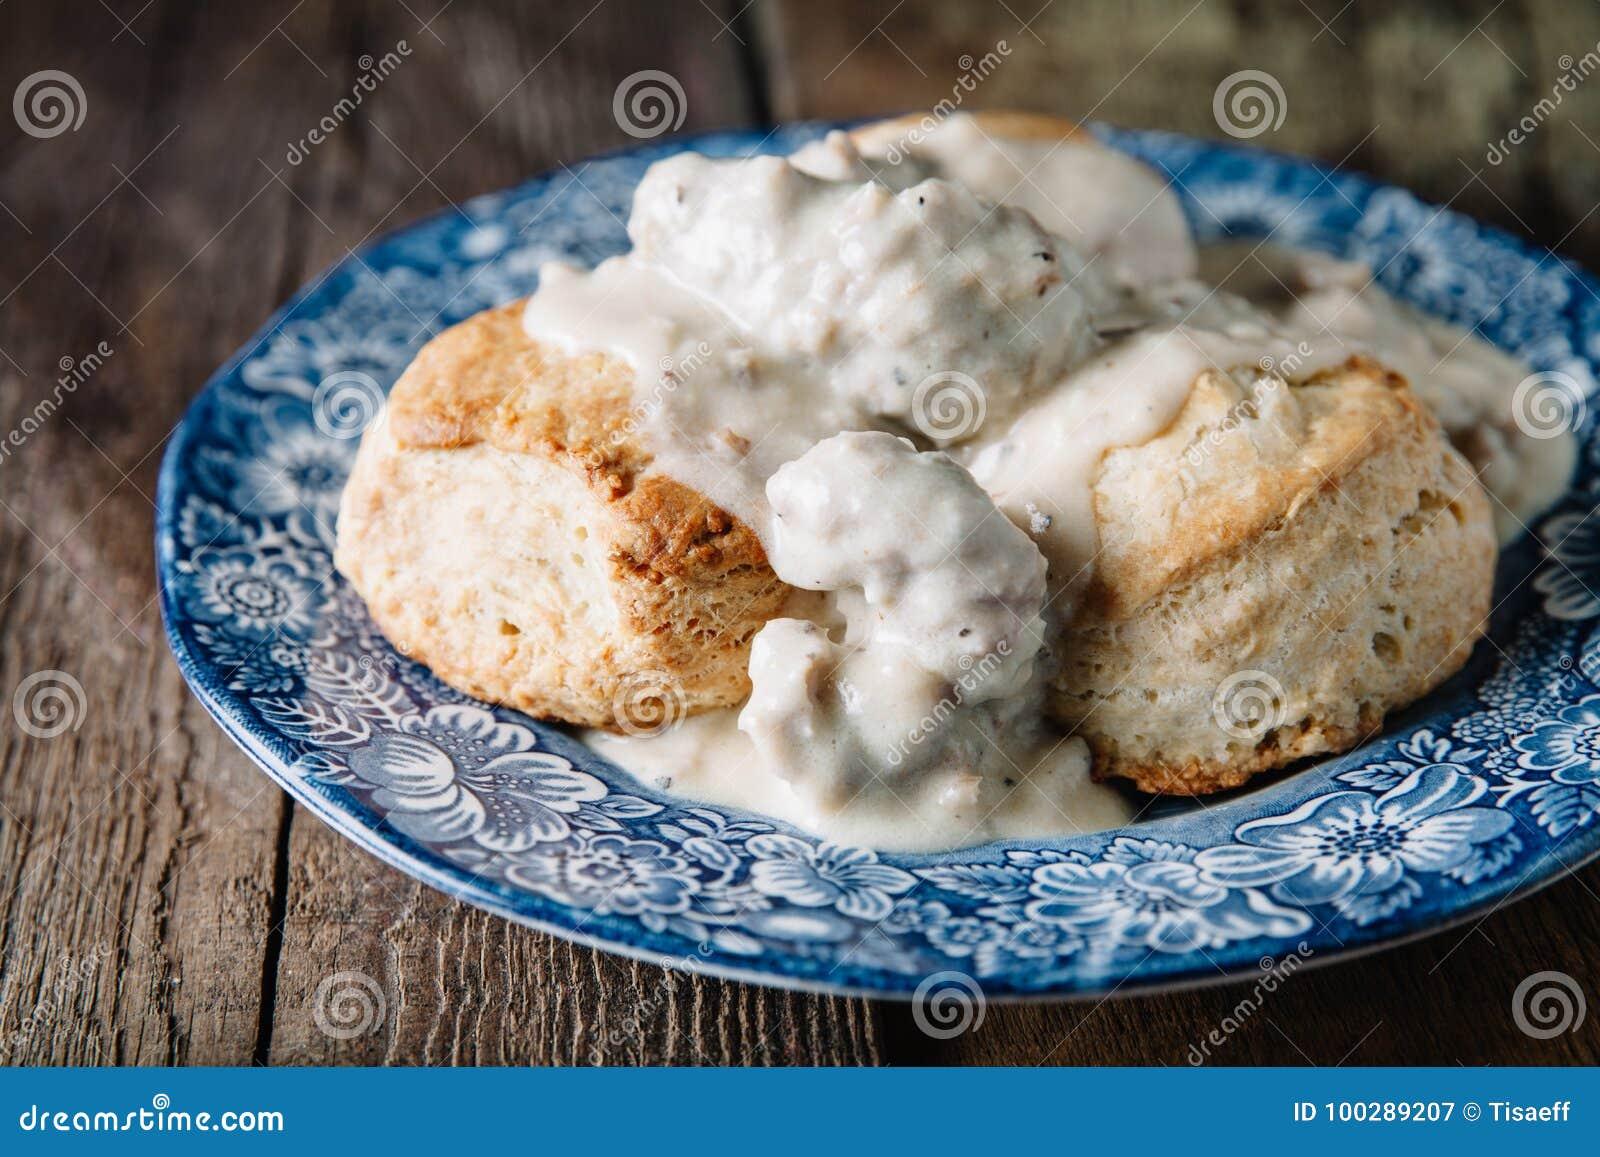 Kekse und Soße